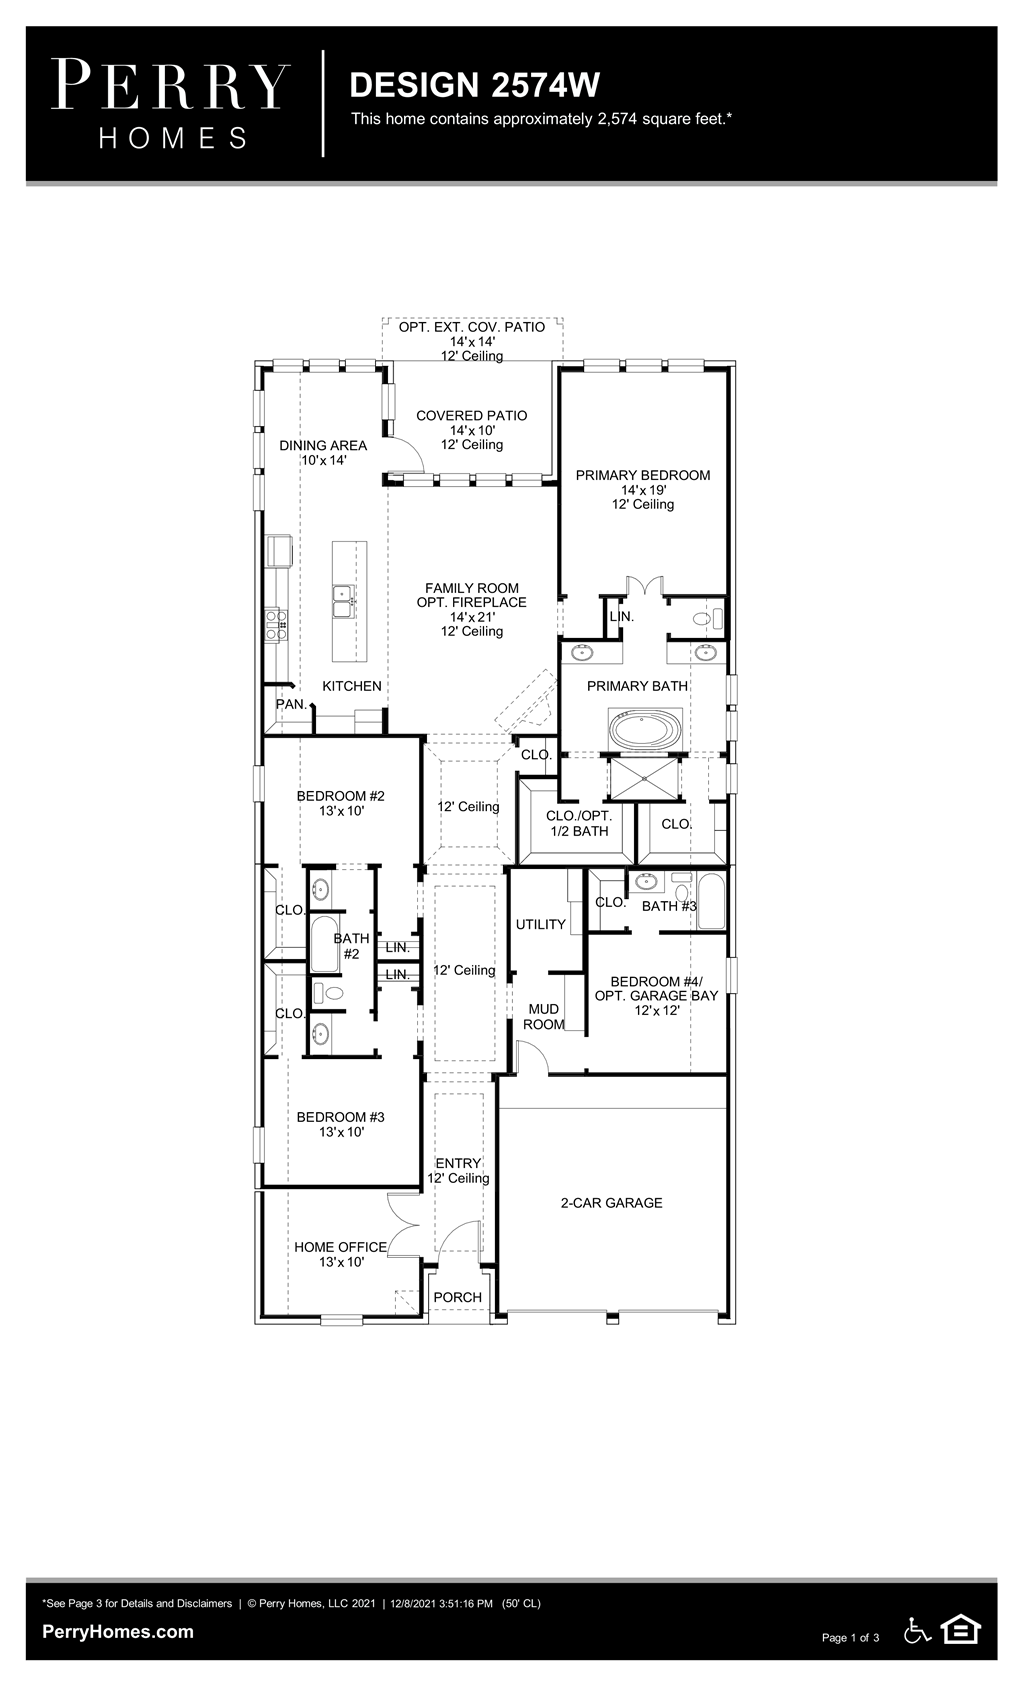 Floor Plan for 2574W